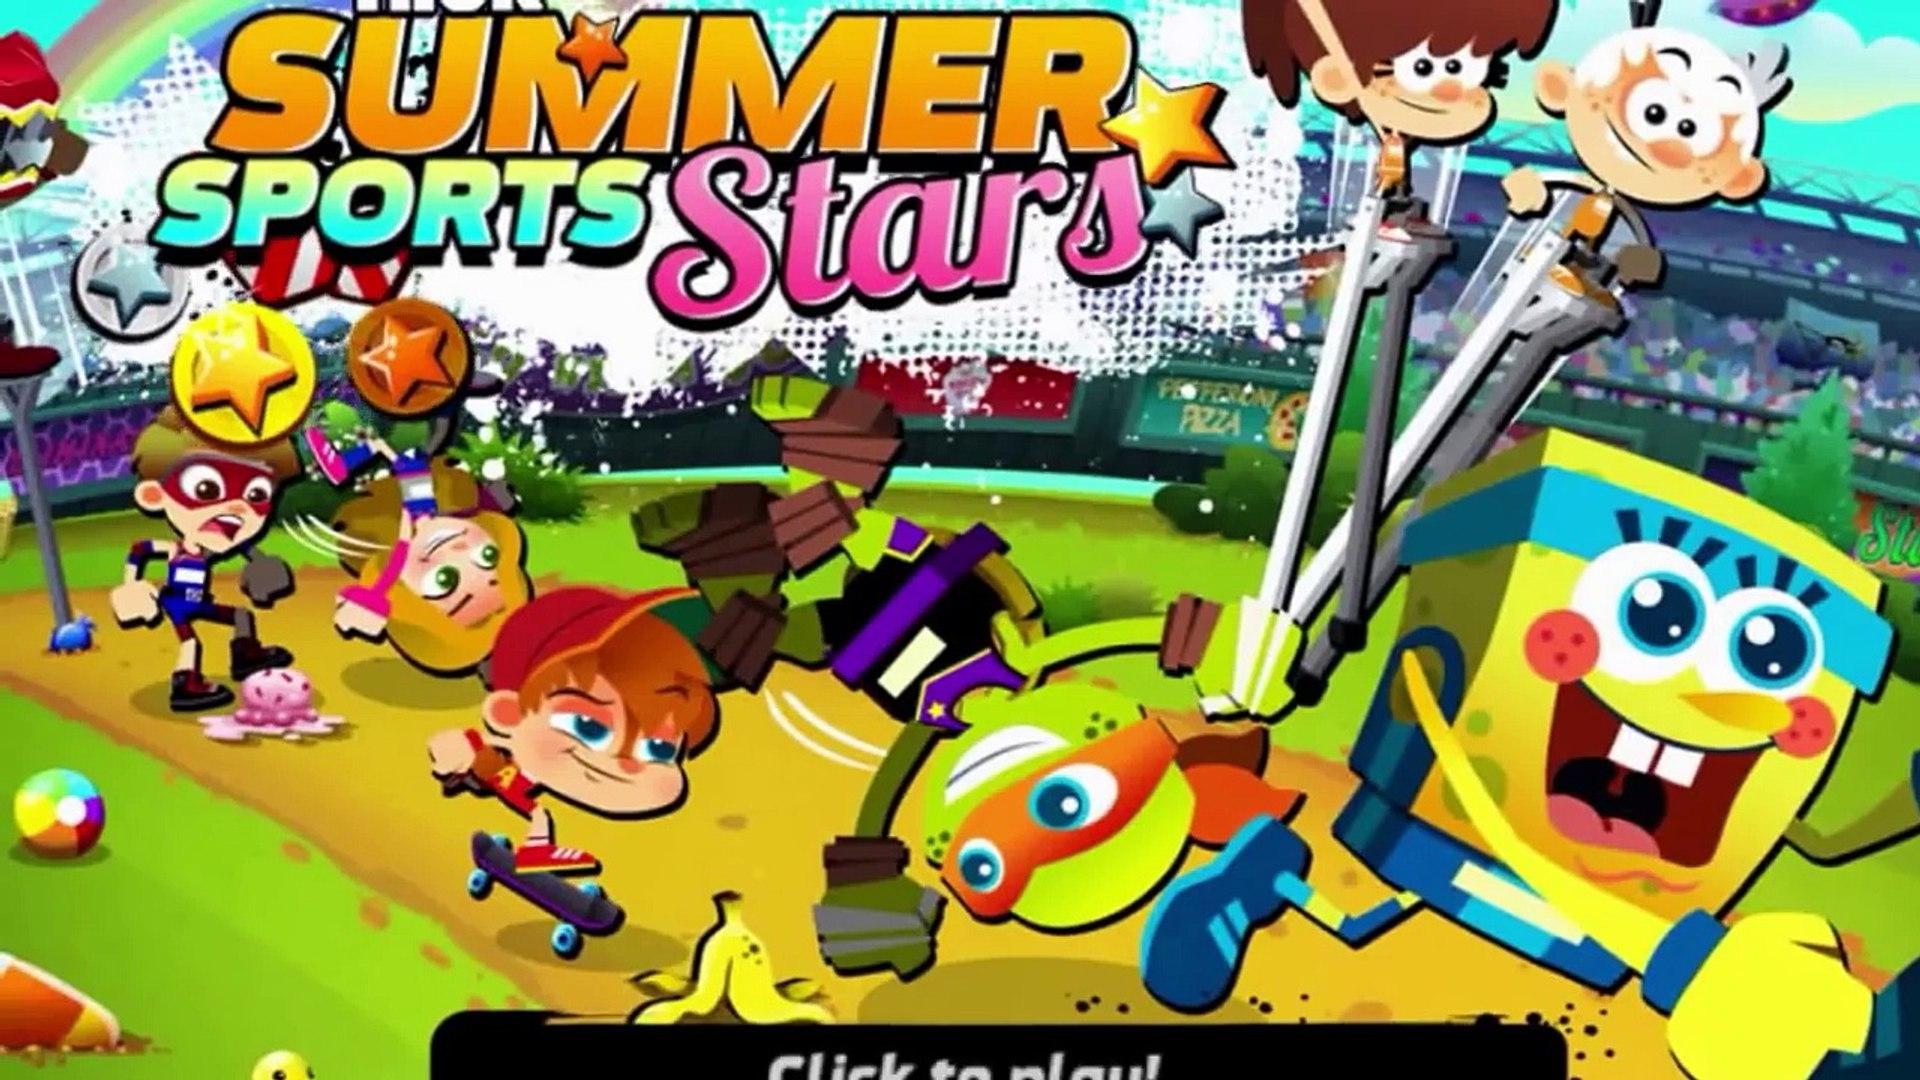 Nickelodeon Summer Sport Stars - Full Video Cartoon for Kids